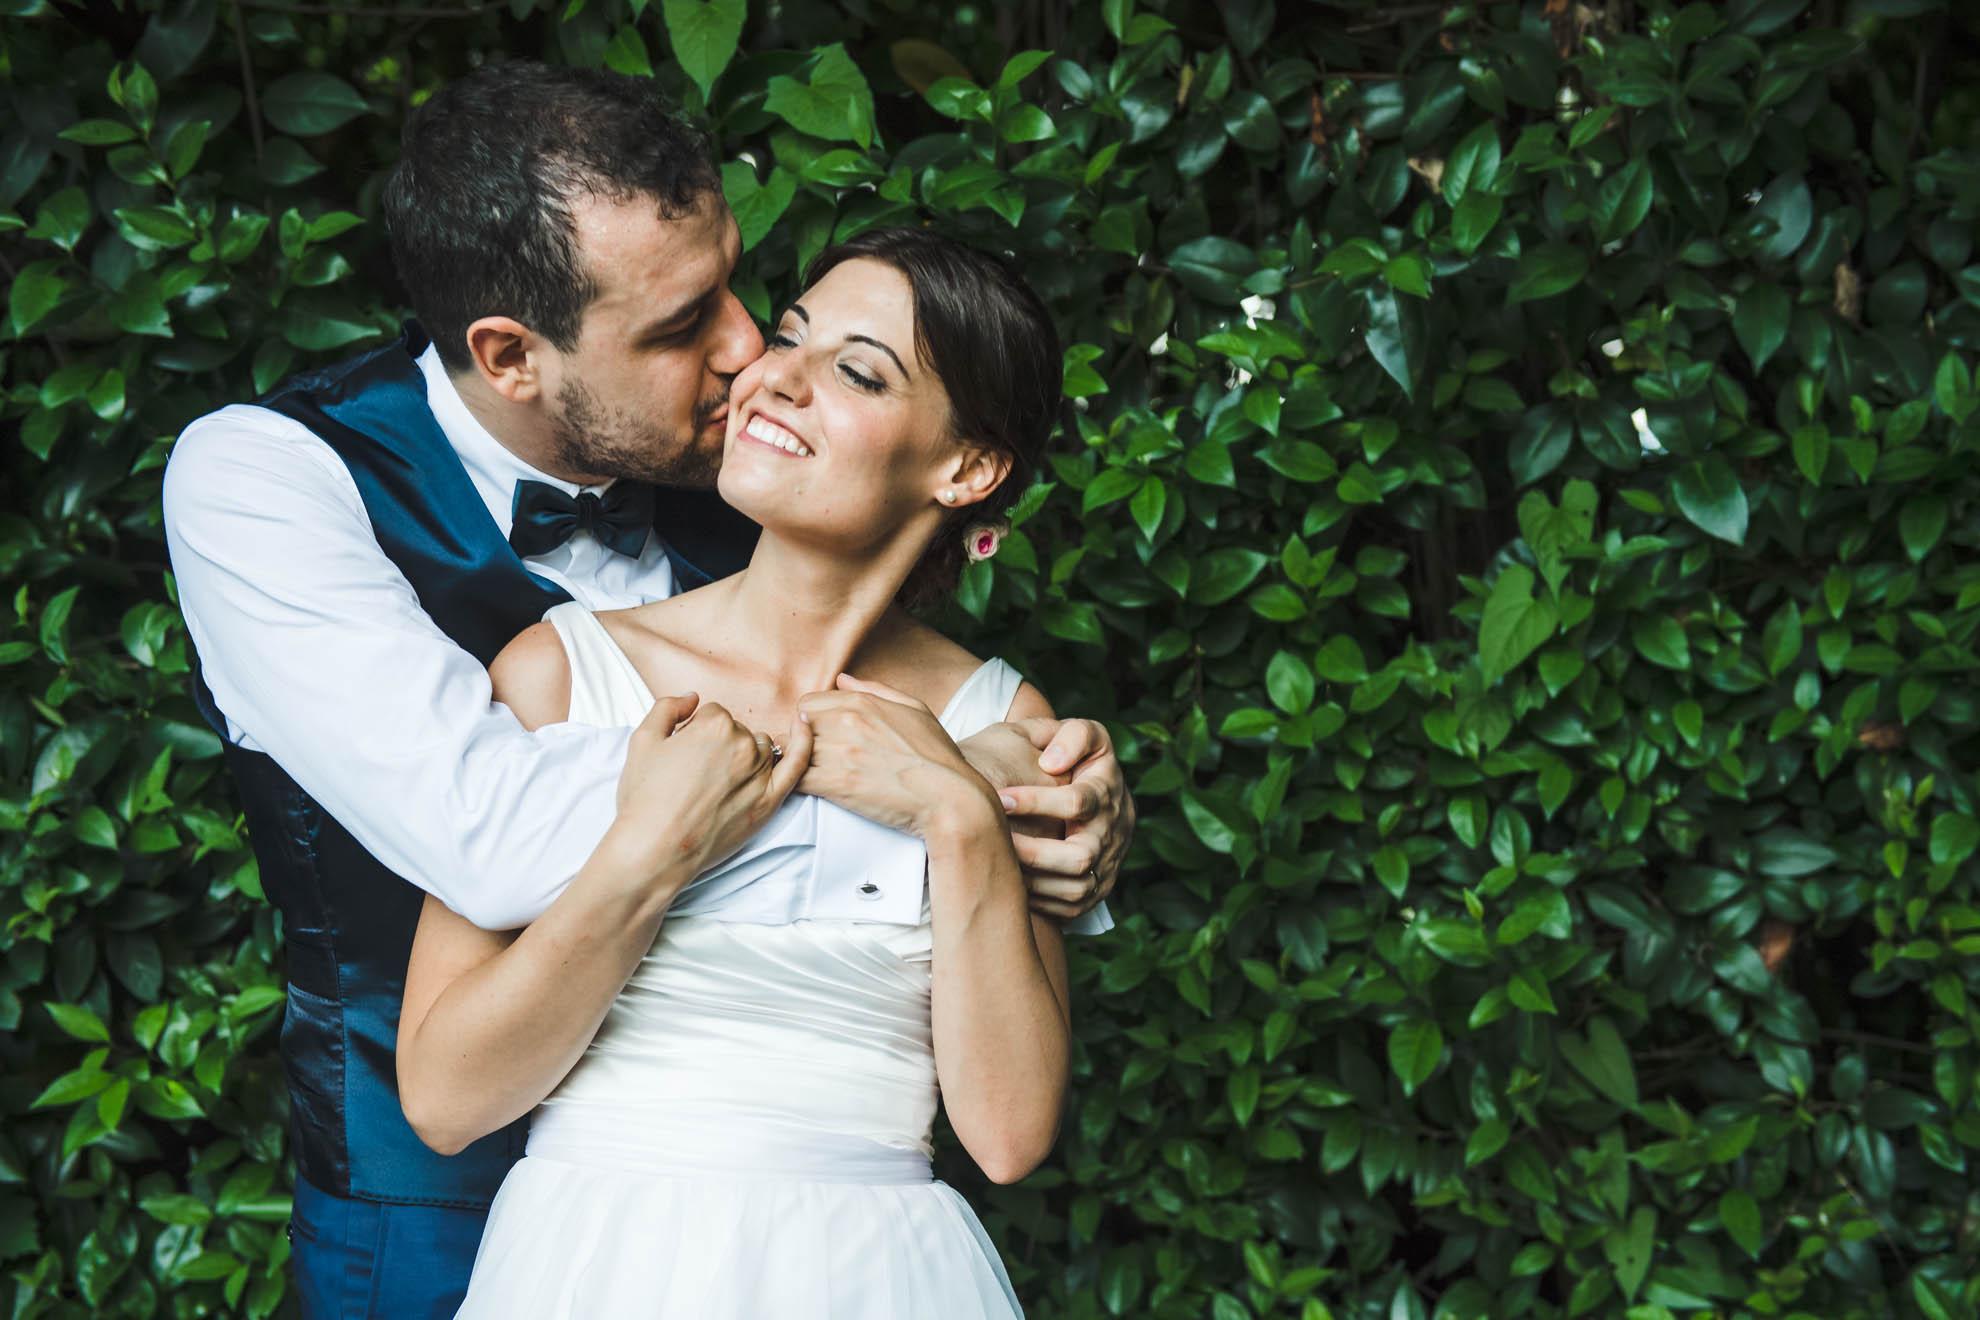 014 Fotografo per Matrimonio Diego Ravenna PaviaD5R_0929